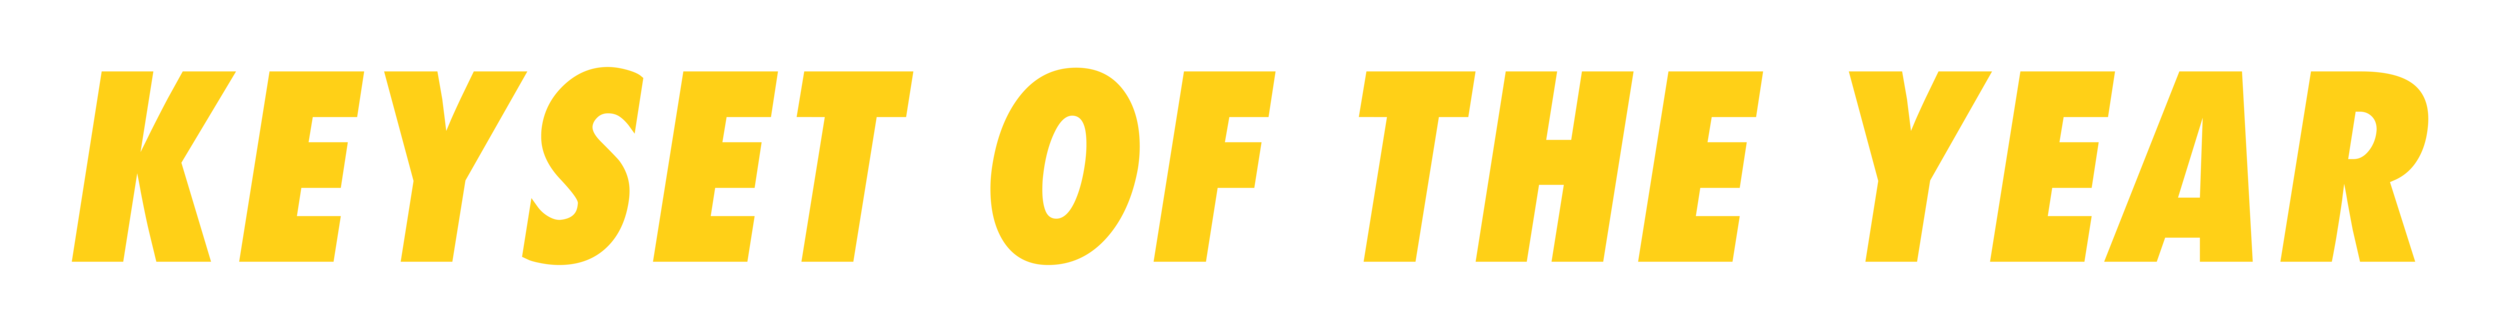 KotY-18.png